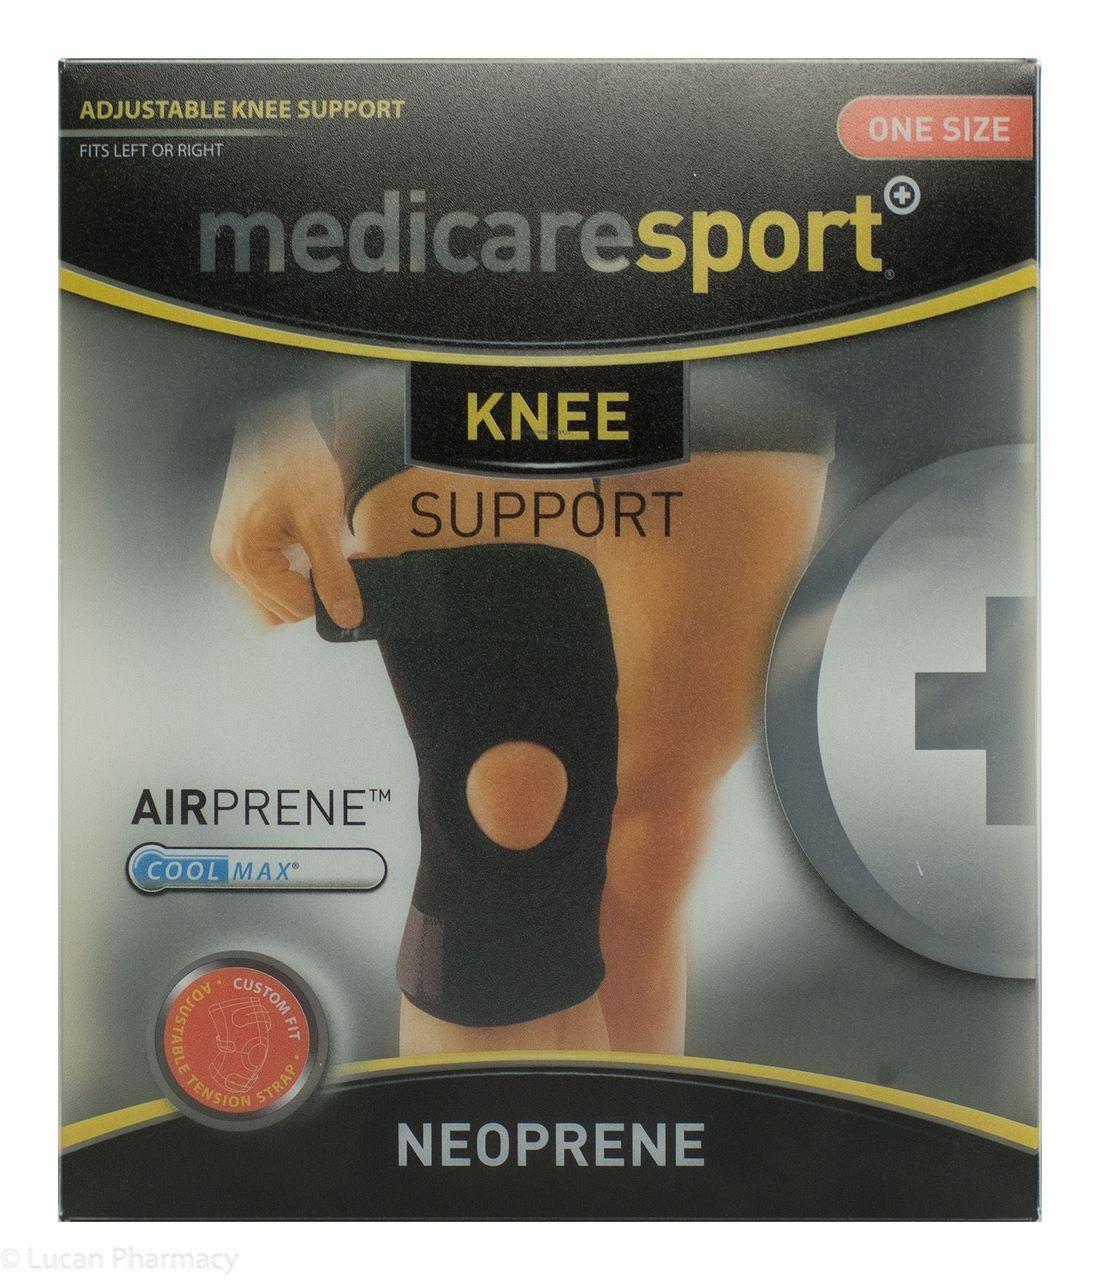 203c132204 Lucan Pharmacy Medicare Sport+® Neoprene Knee Support - One Size Fits All